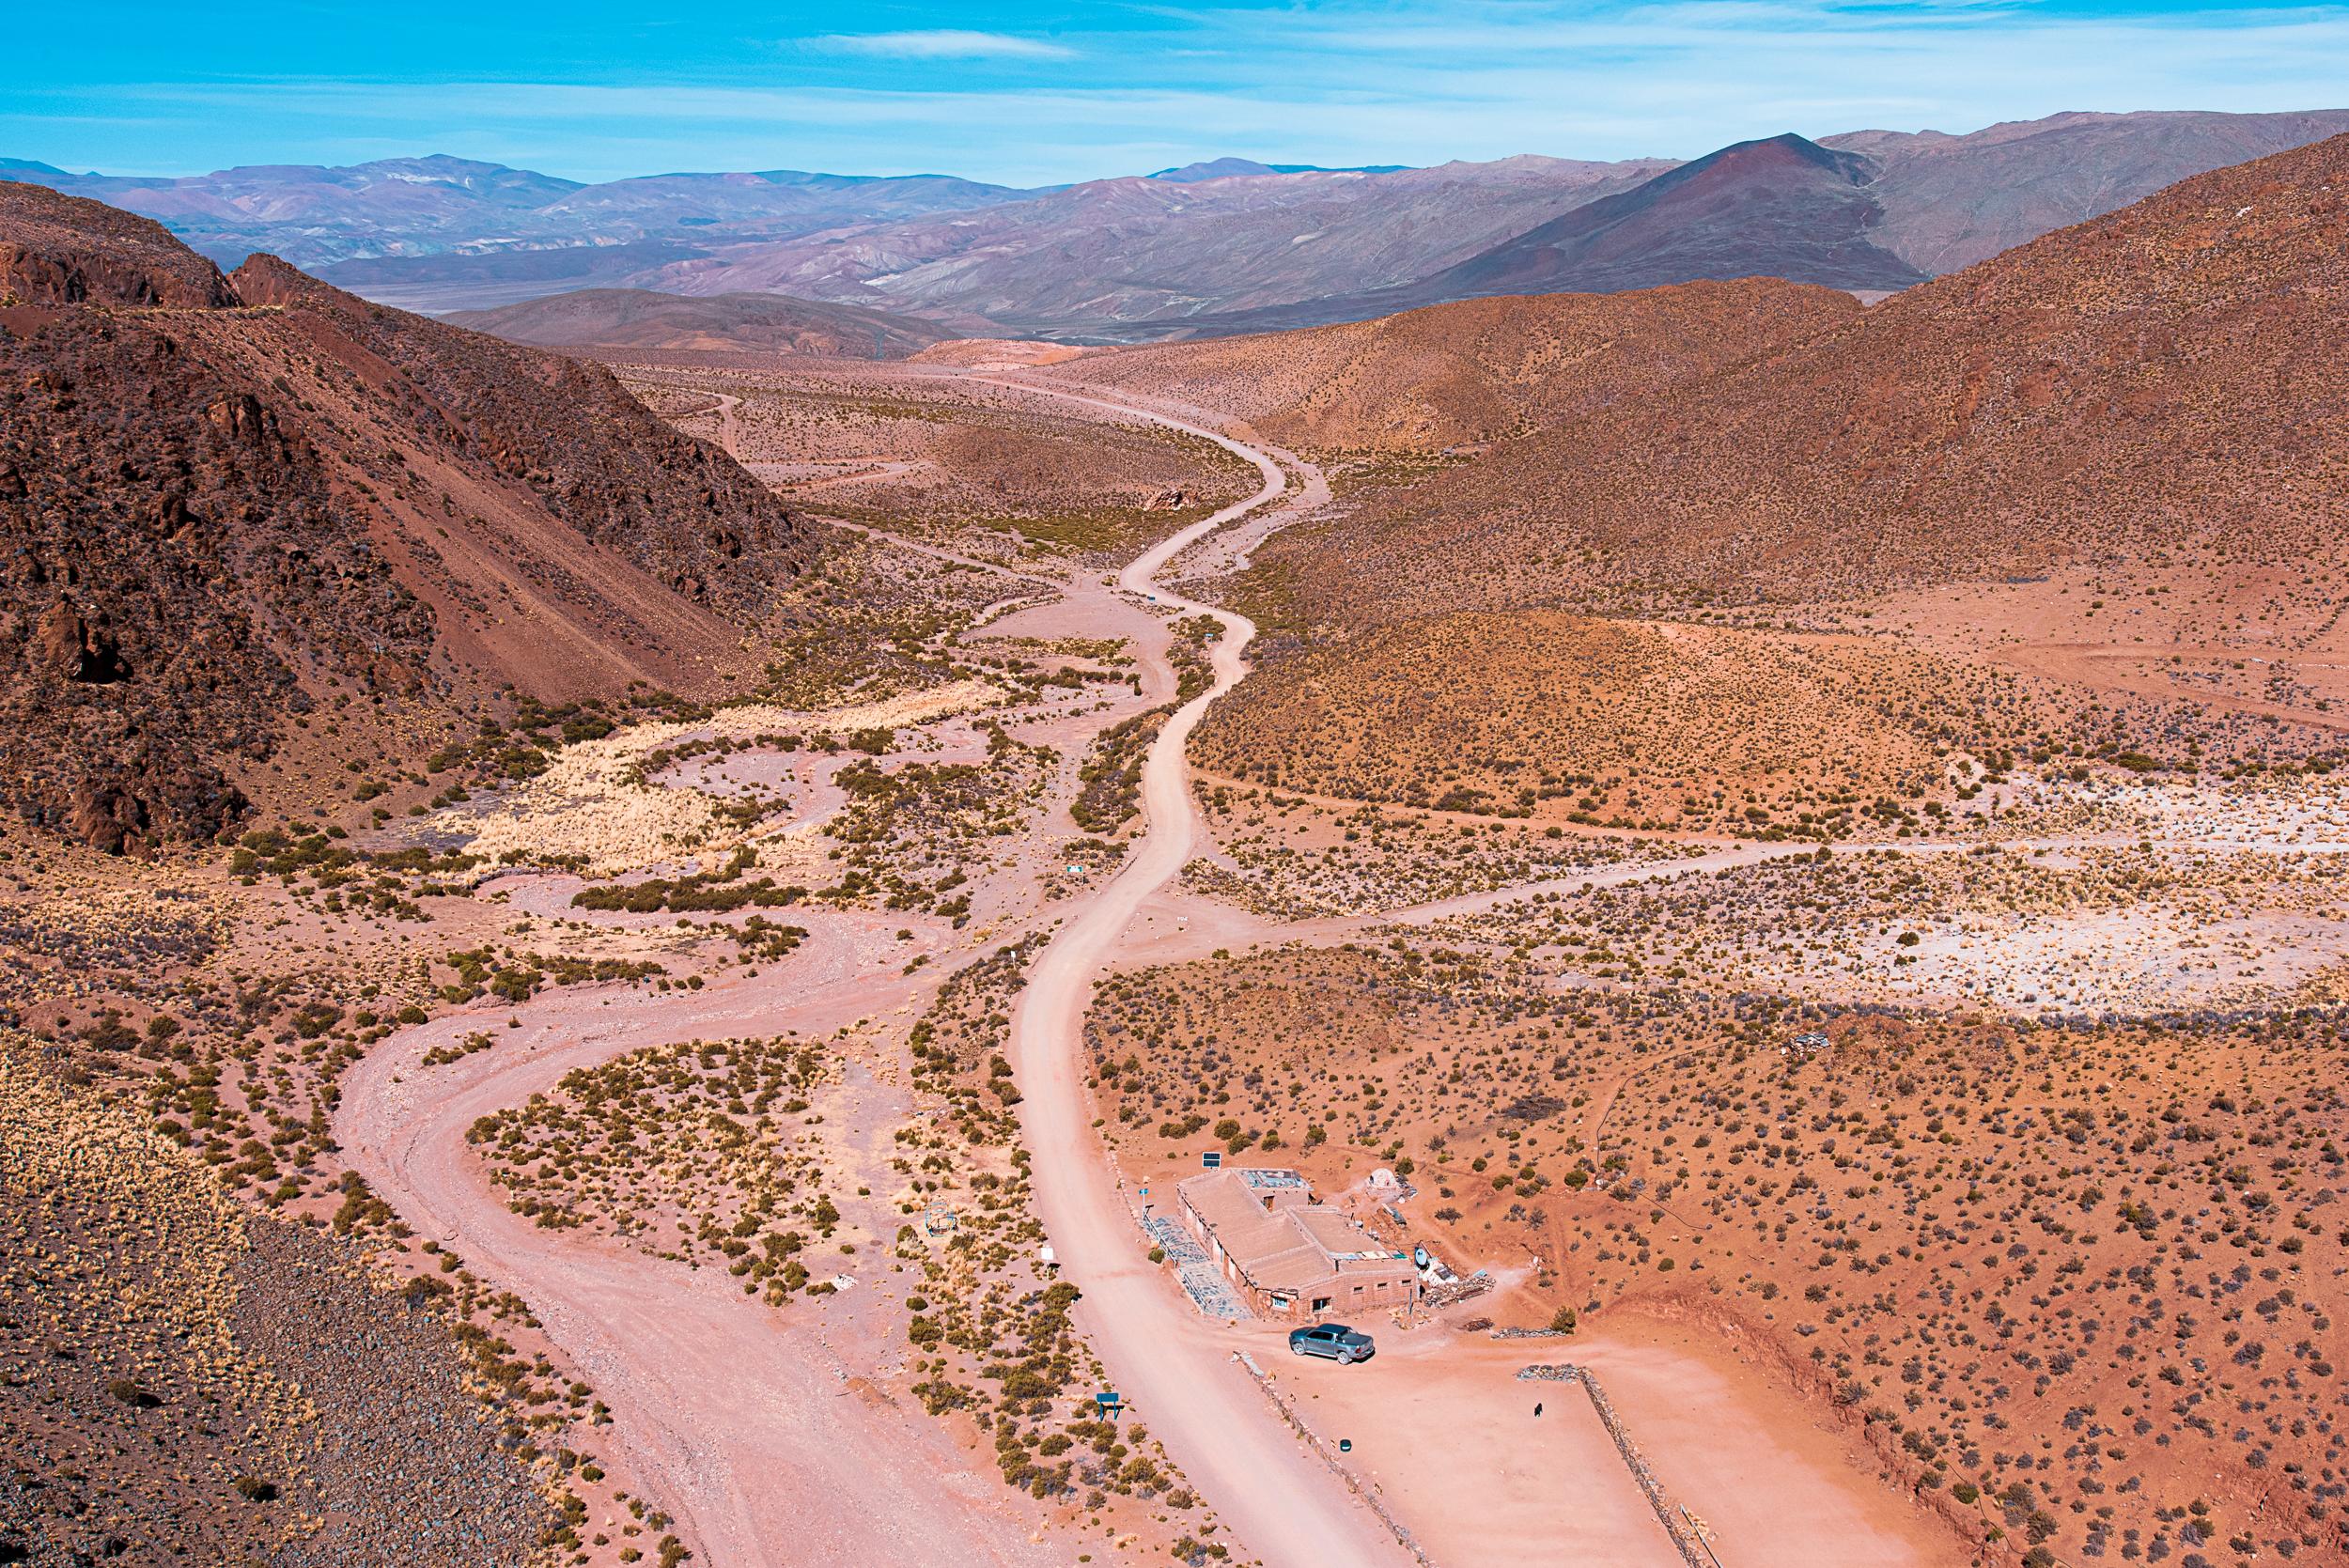 Jujuy - Argentina